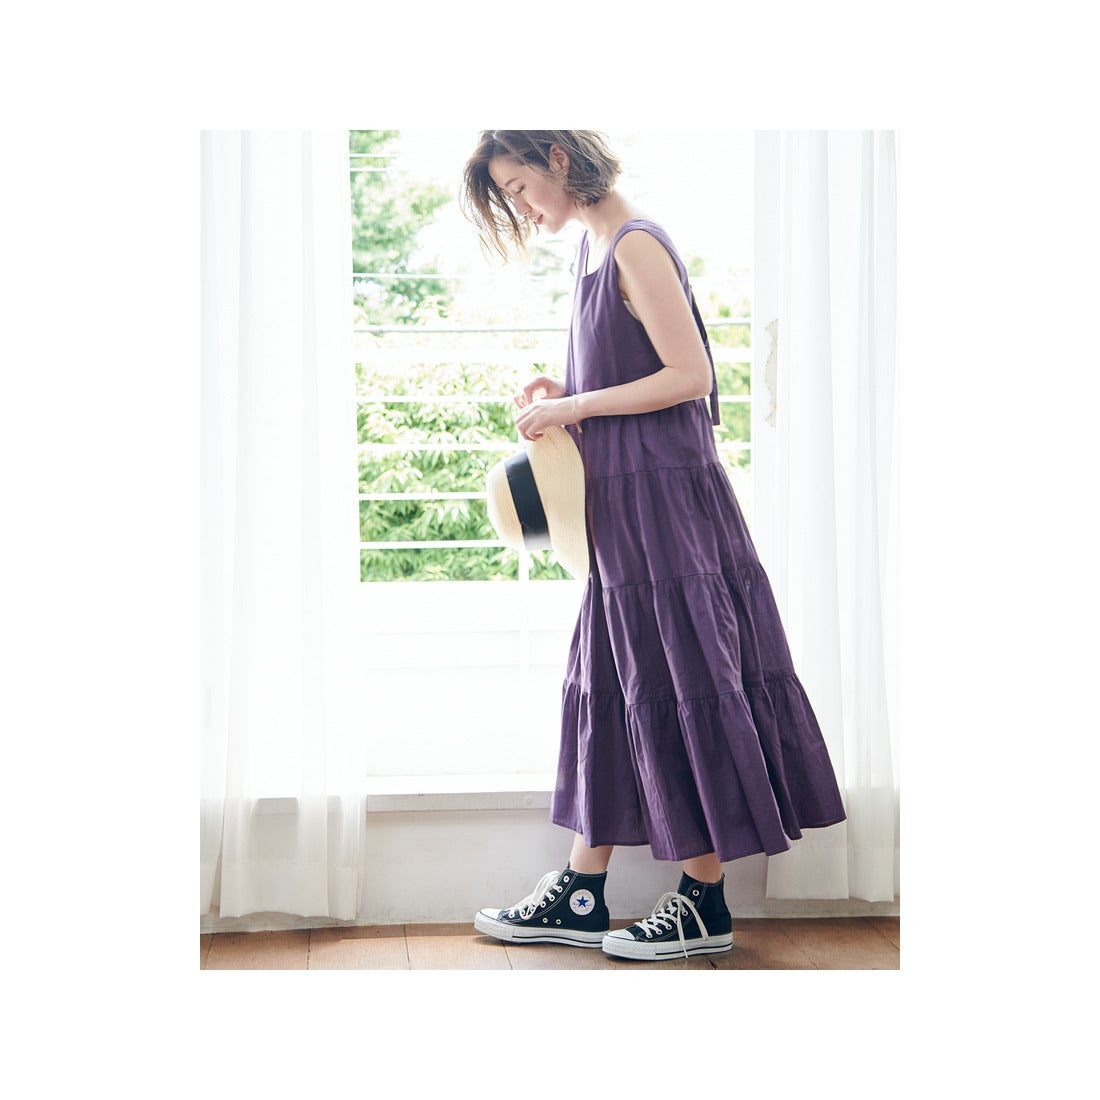 f3fa512163ea3 ROPE  PICNIC  WEB限定 バックレースアップティアードワンピース(パープル(50)) 返品不可商品  -靴&ファッション通販 ロコンド〜 自宅で試着、気軽に返品